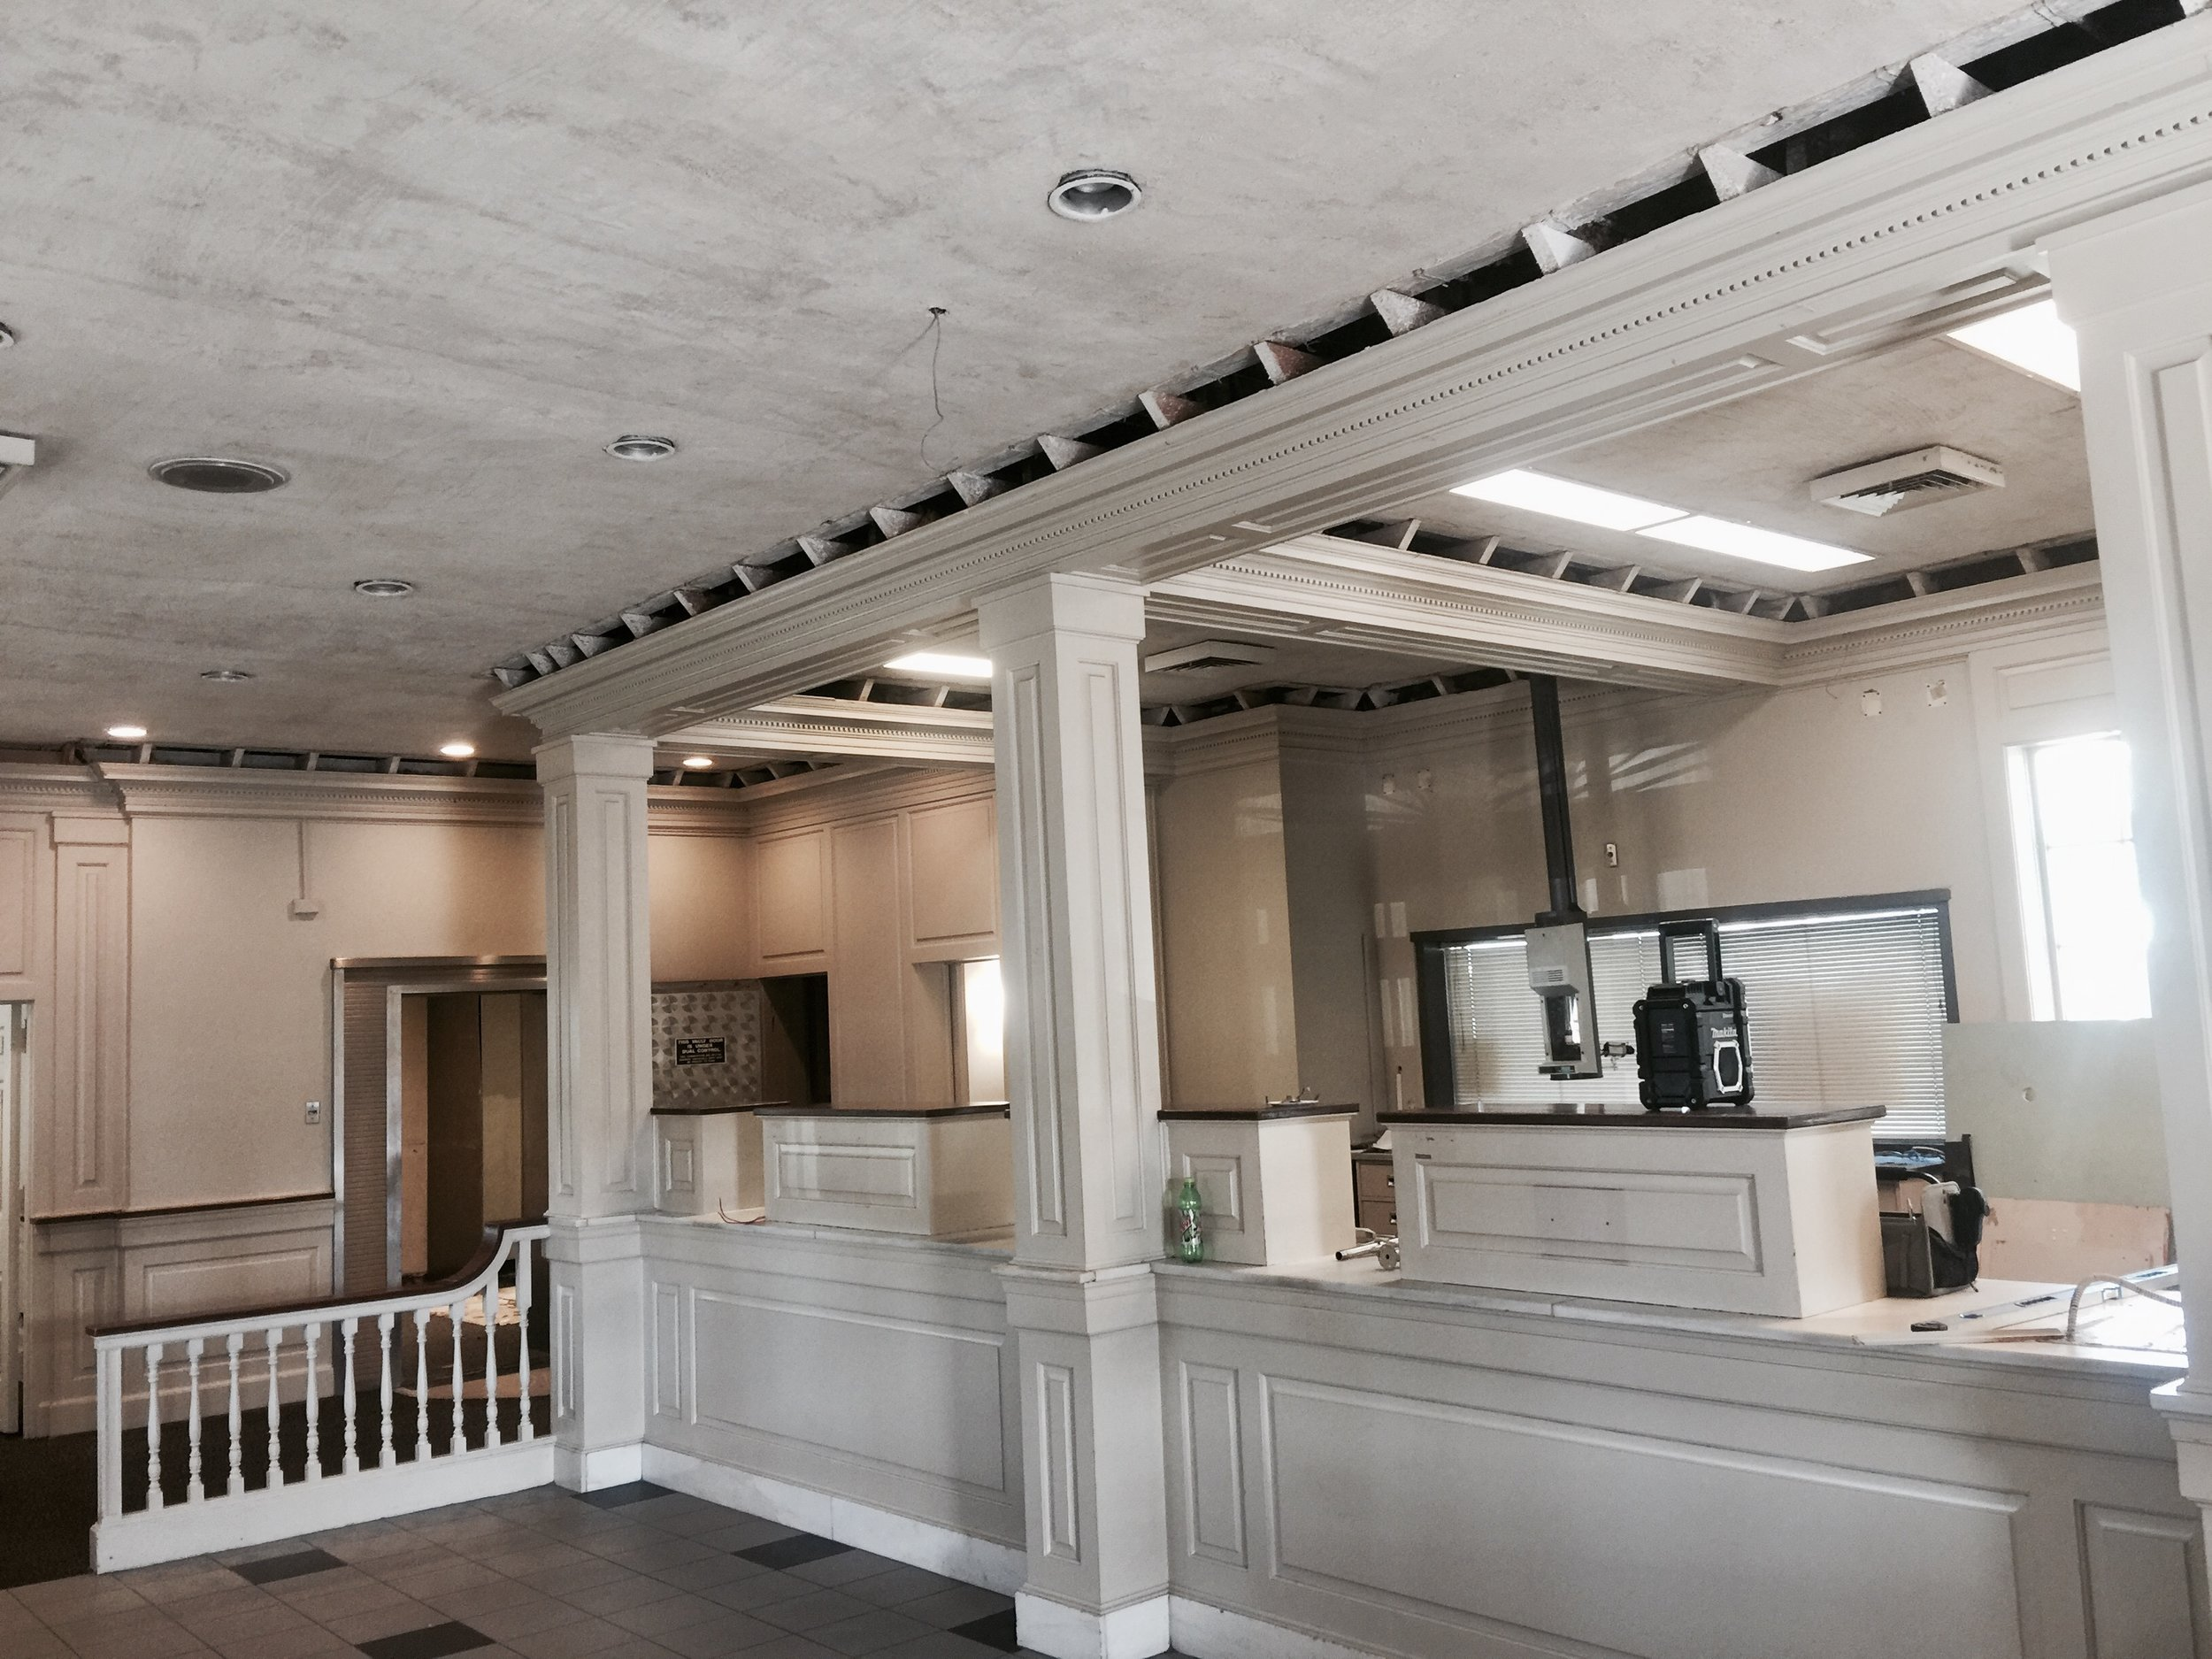 Avadian Credit Union's new Homewood location